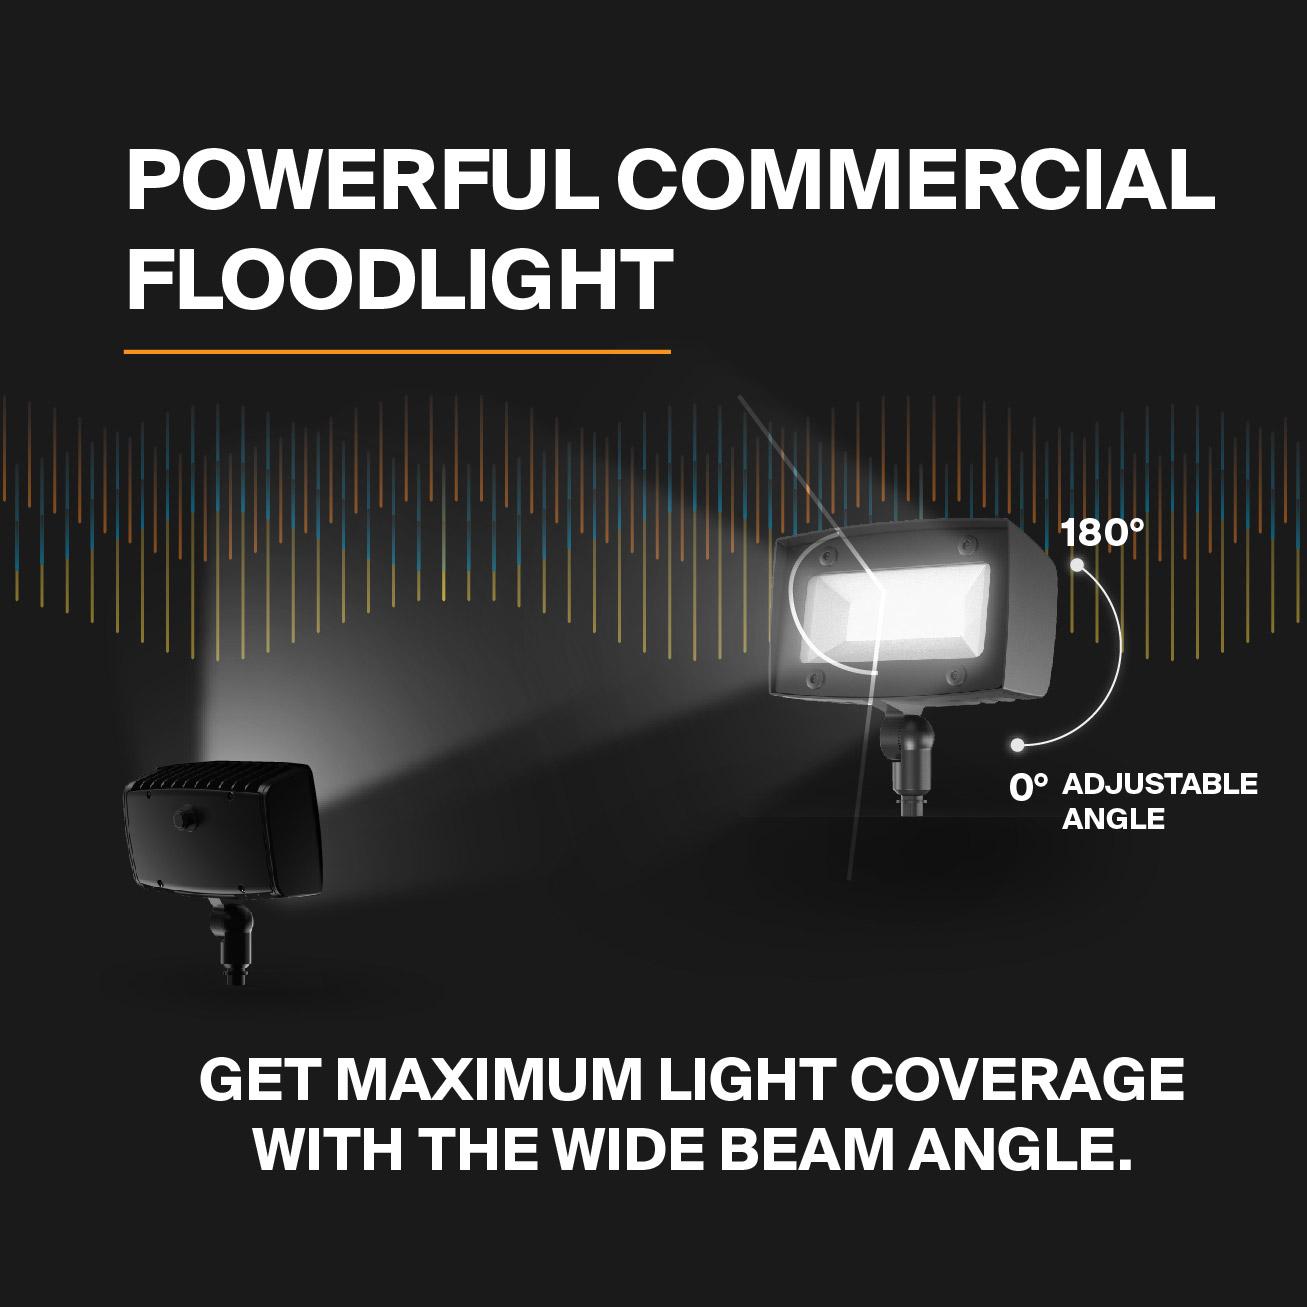 Probrite Powerflood50 LED Flood Light Commercial